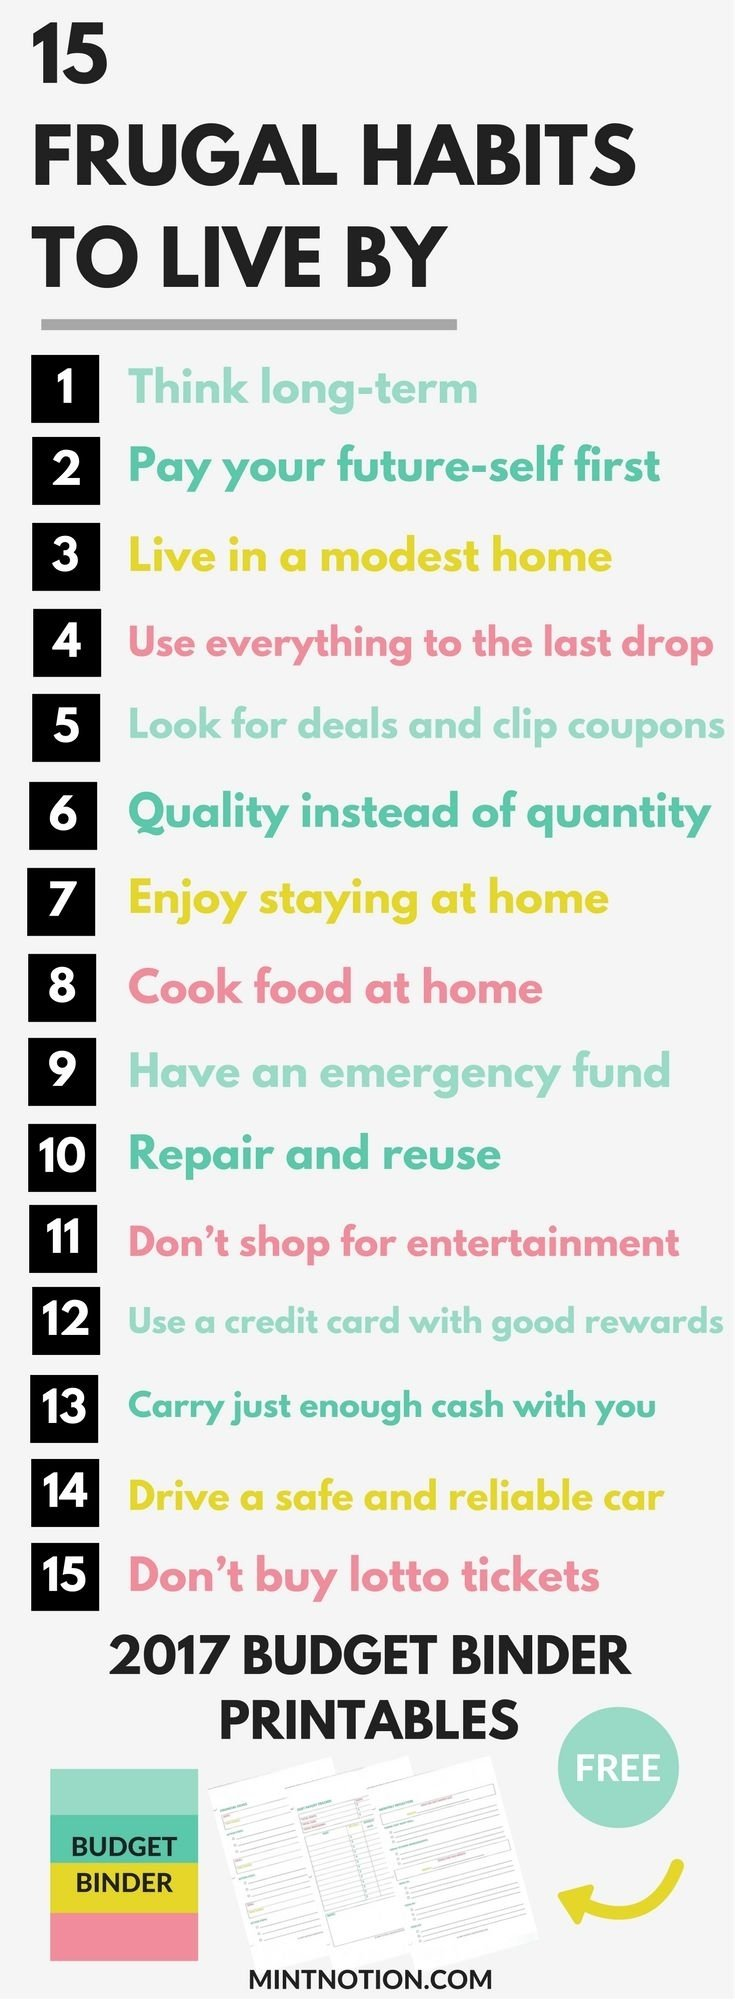 10 Awesome Frugal Ideas To Save Money les 58 meilleures images du tableau budget financial planning sur